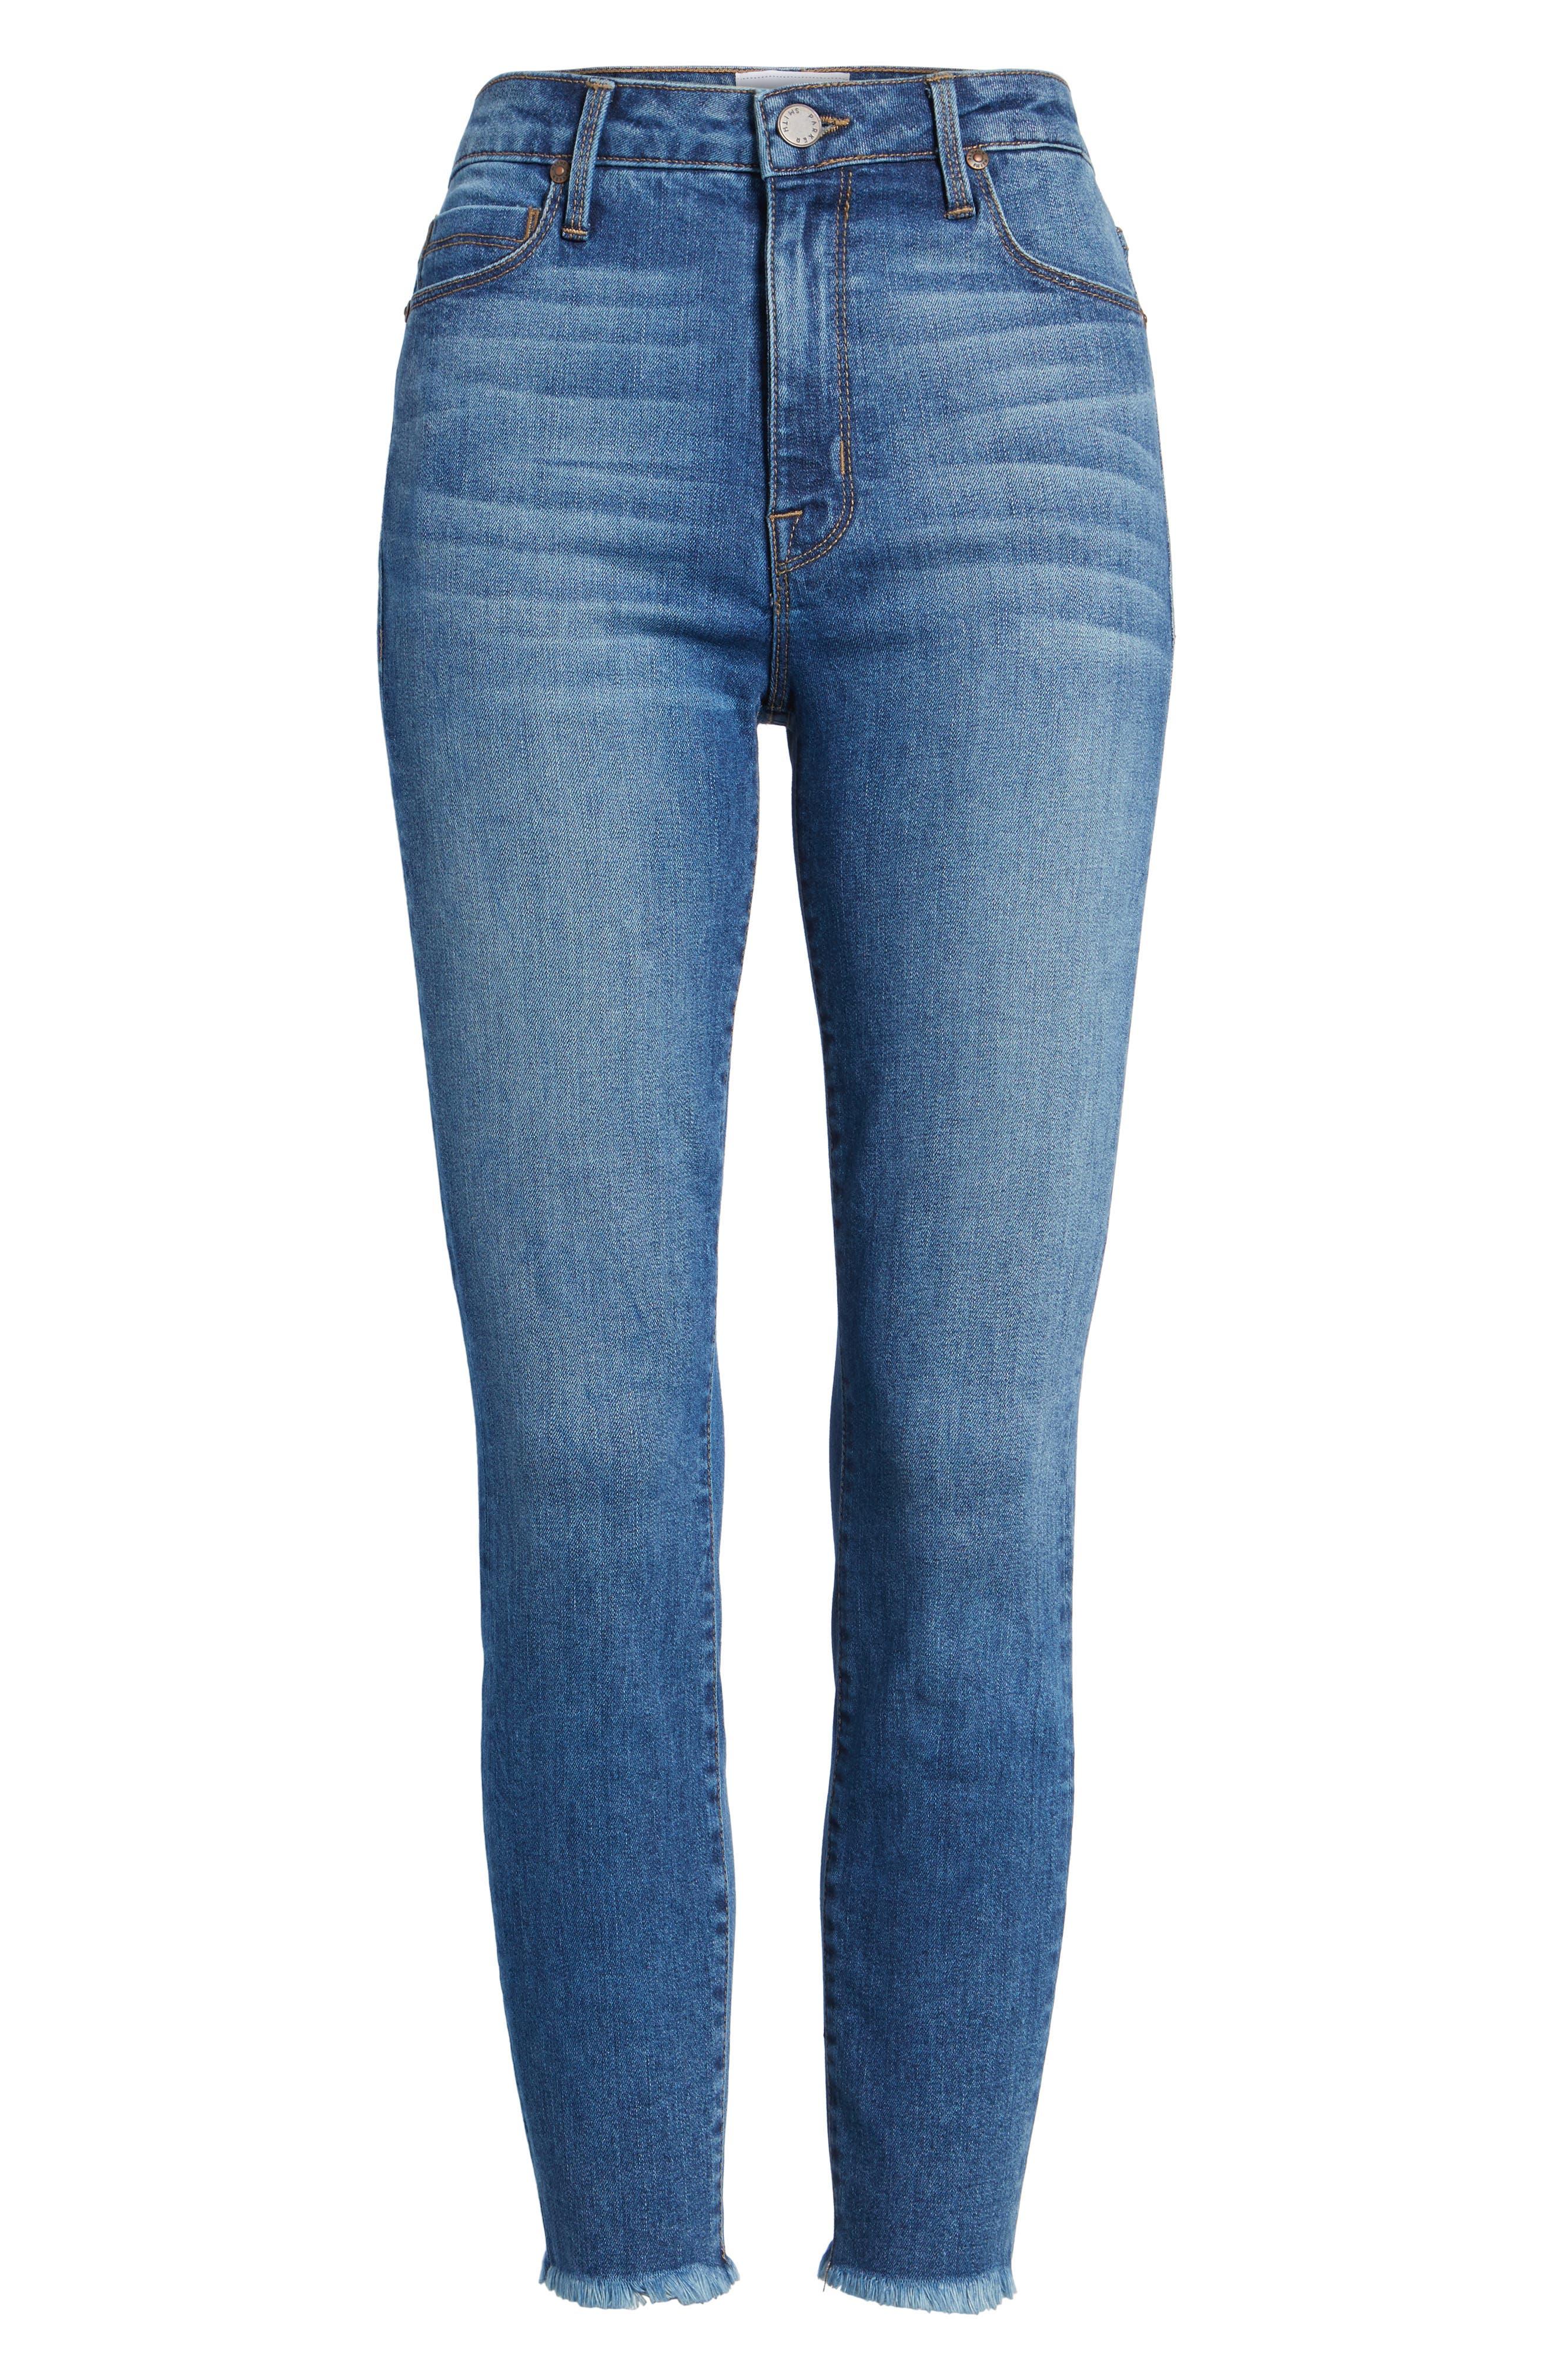 Bombshell Raw Hem Stretch Skinny Jeans,                             Alternate thumbnail 7, color,                             Dawn